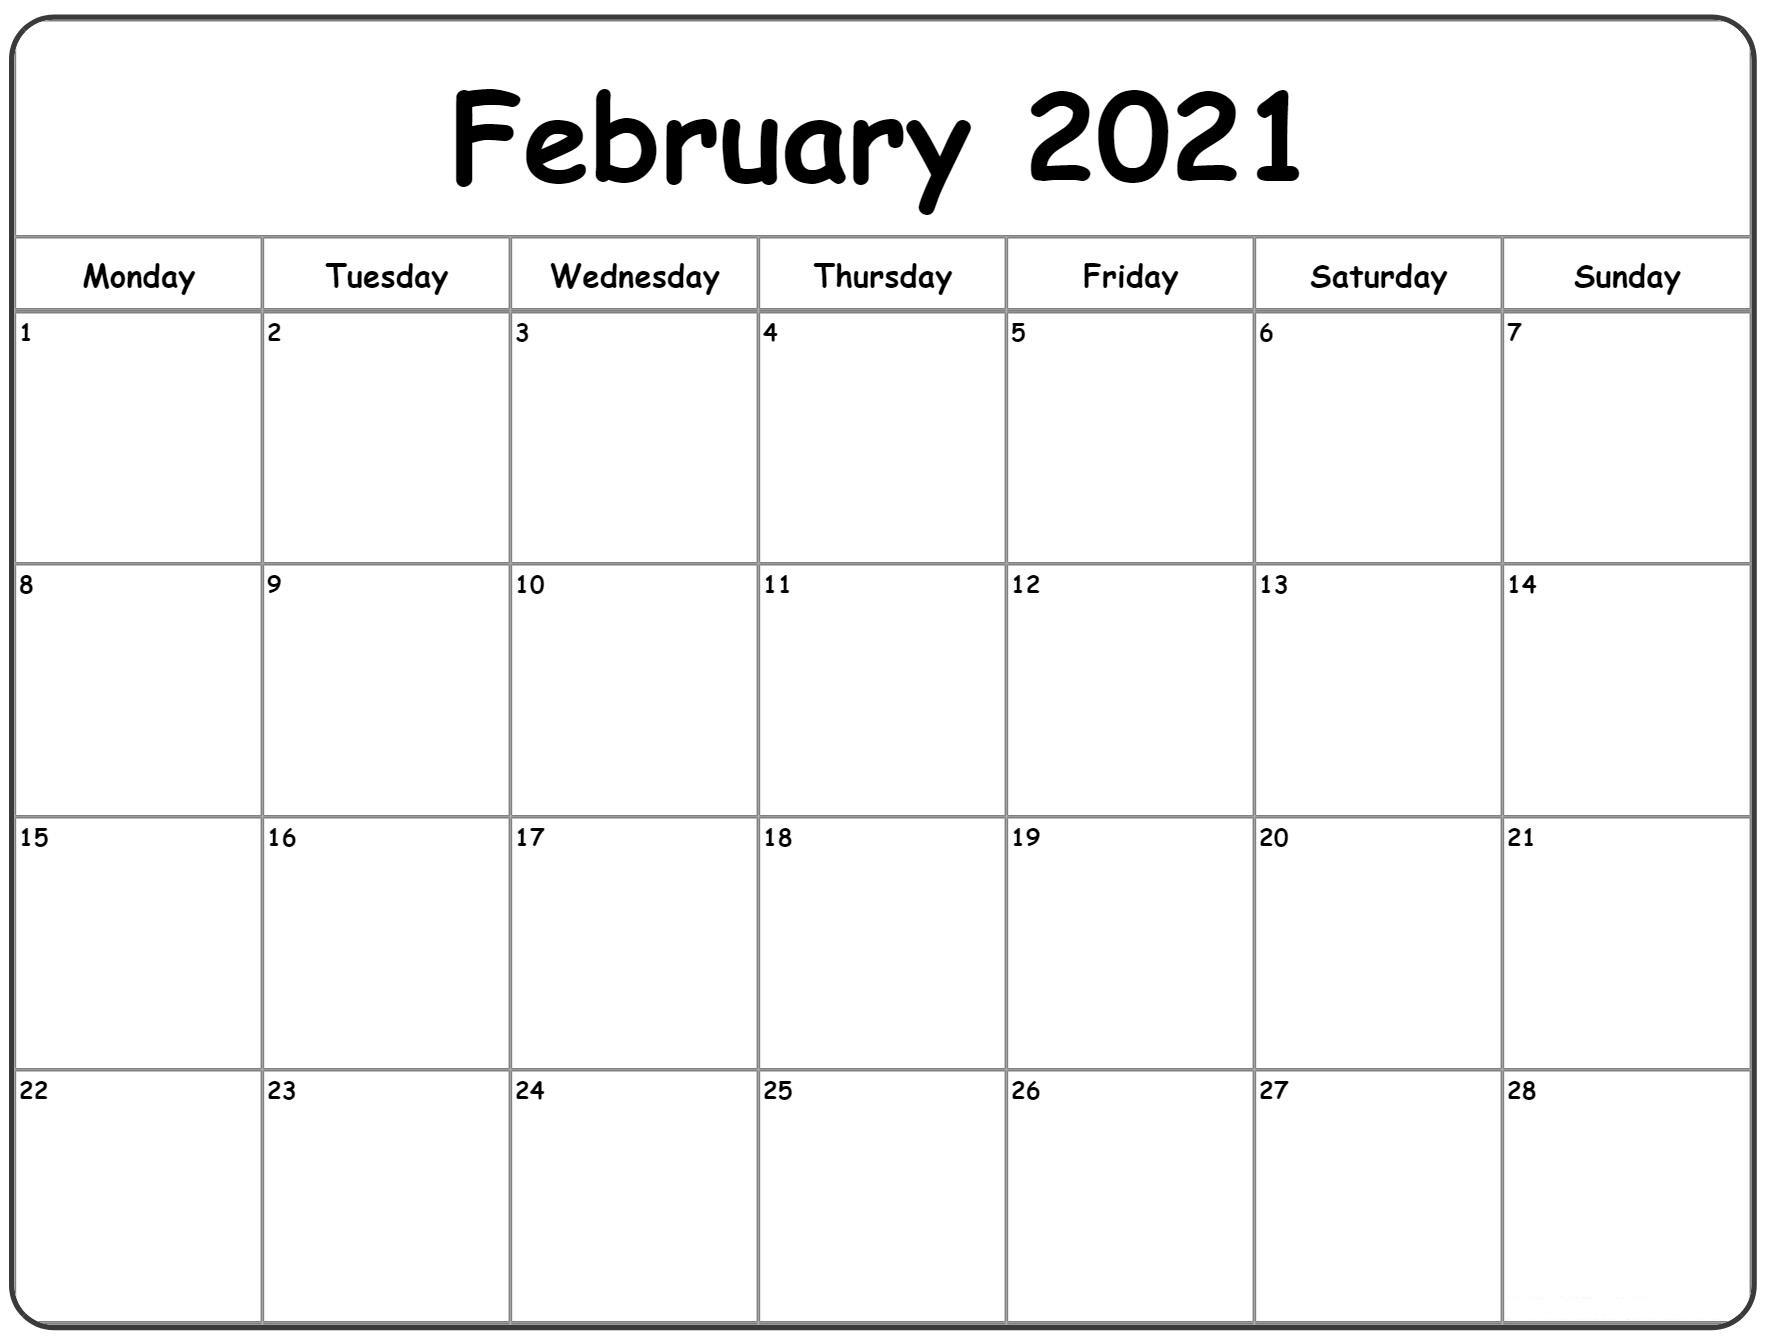 February 2021 Calendar Kalnirnay